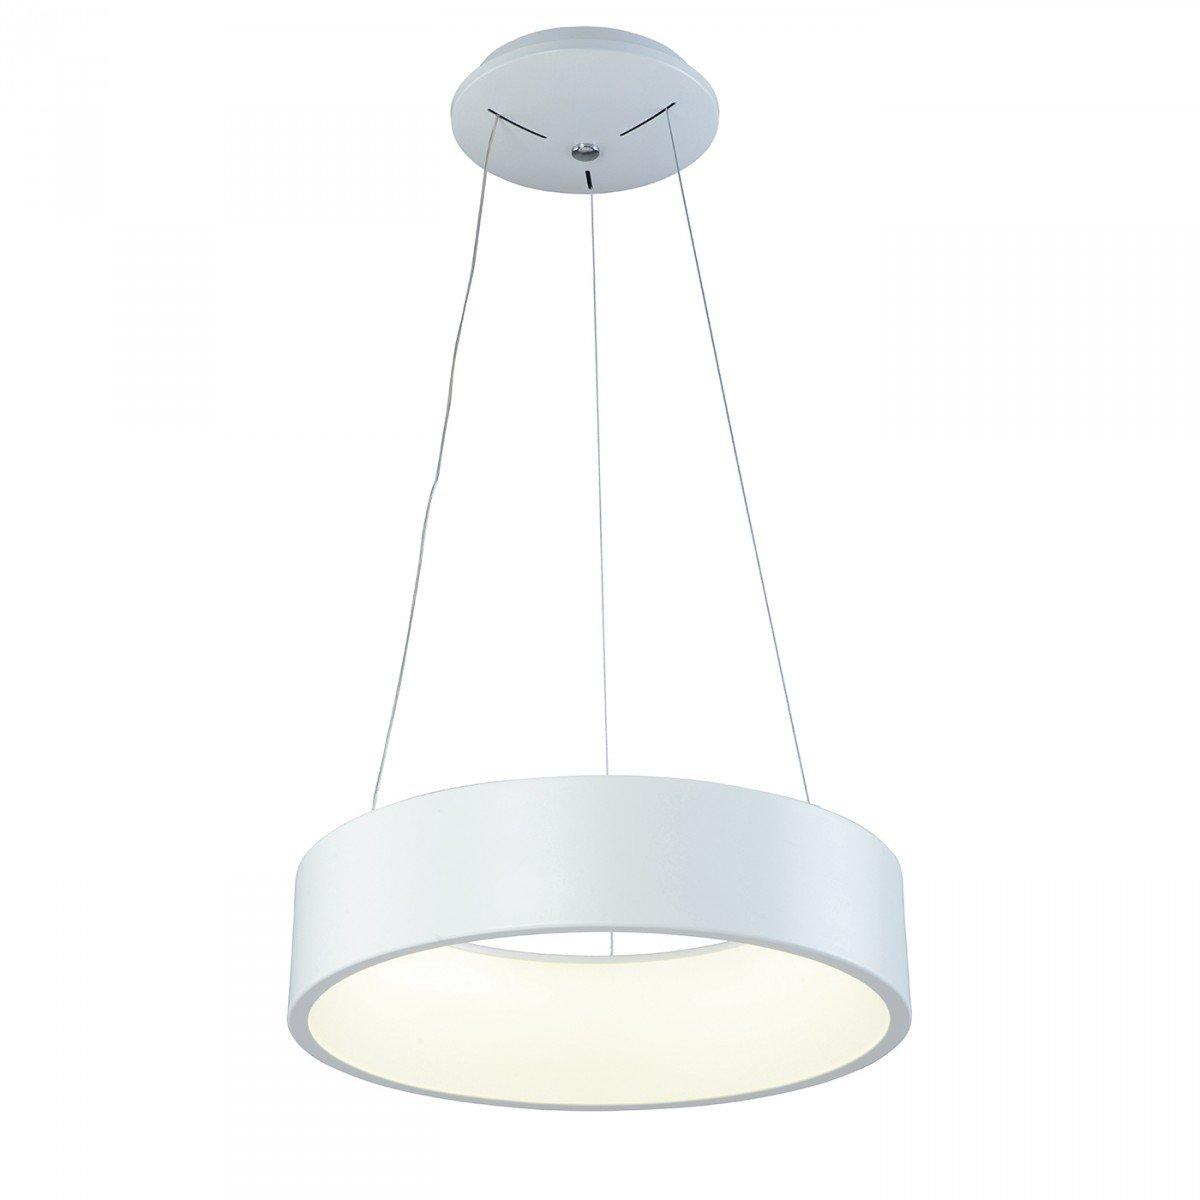 Hole Lámpara Colgante blanco 42W LED 60x120cm